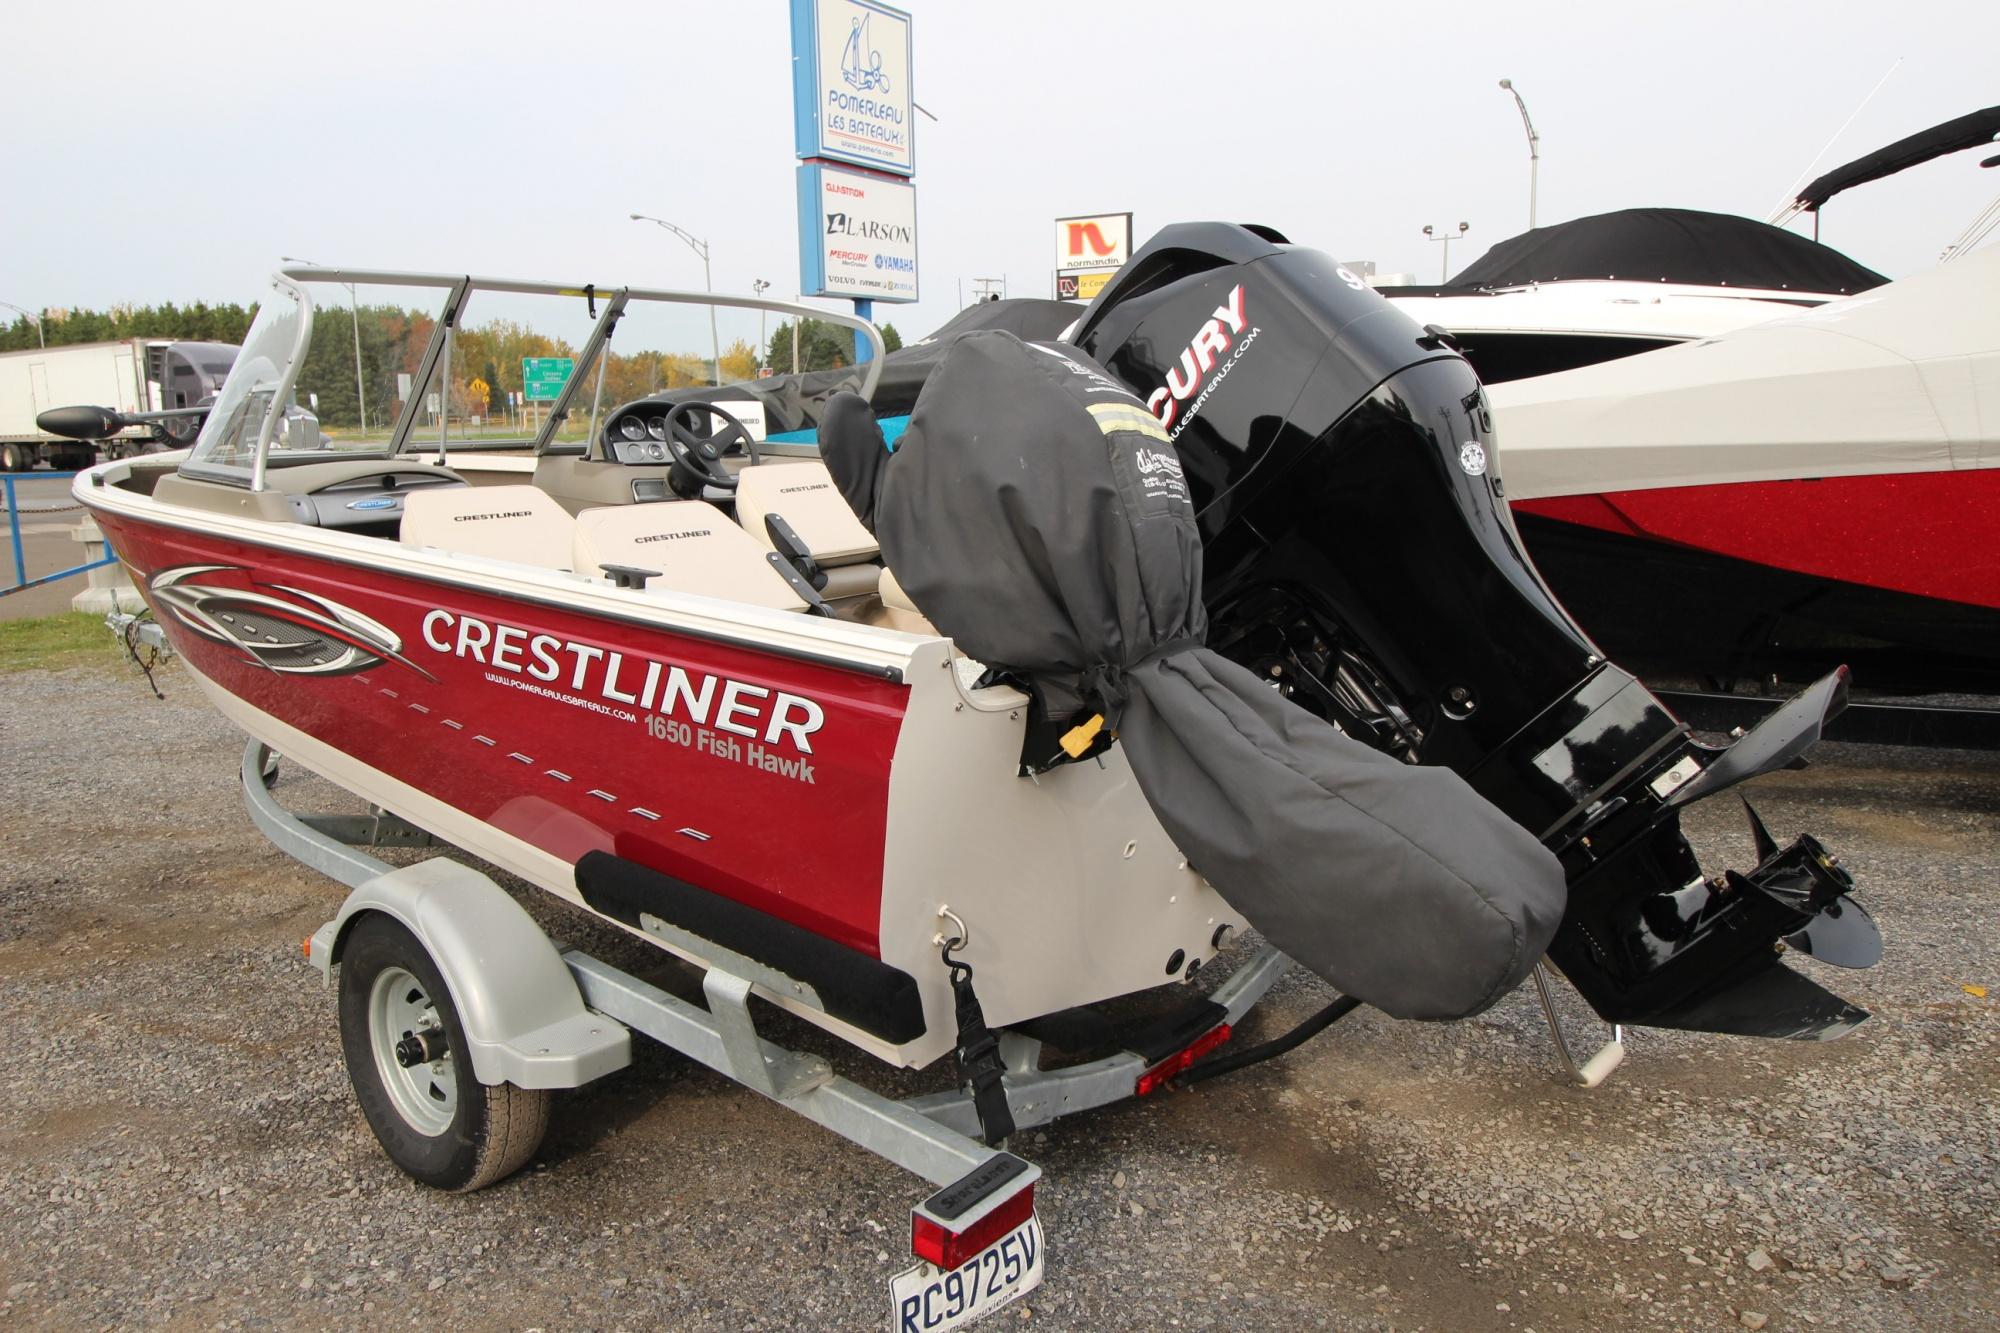 CRESLINER 1650 FISH HAWK - IMG_0096